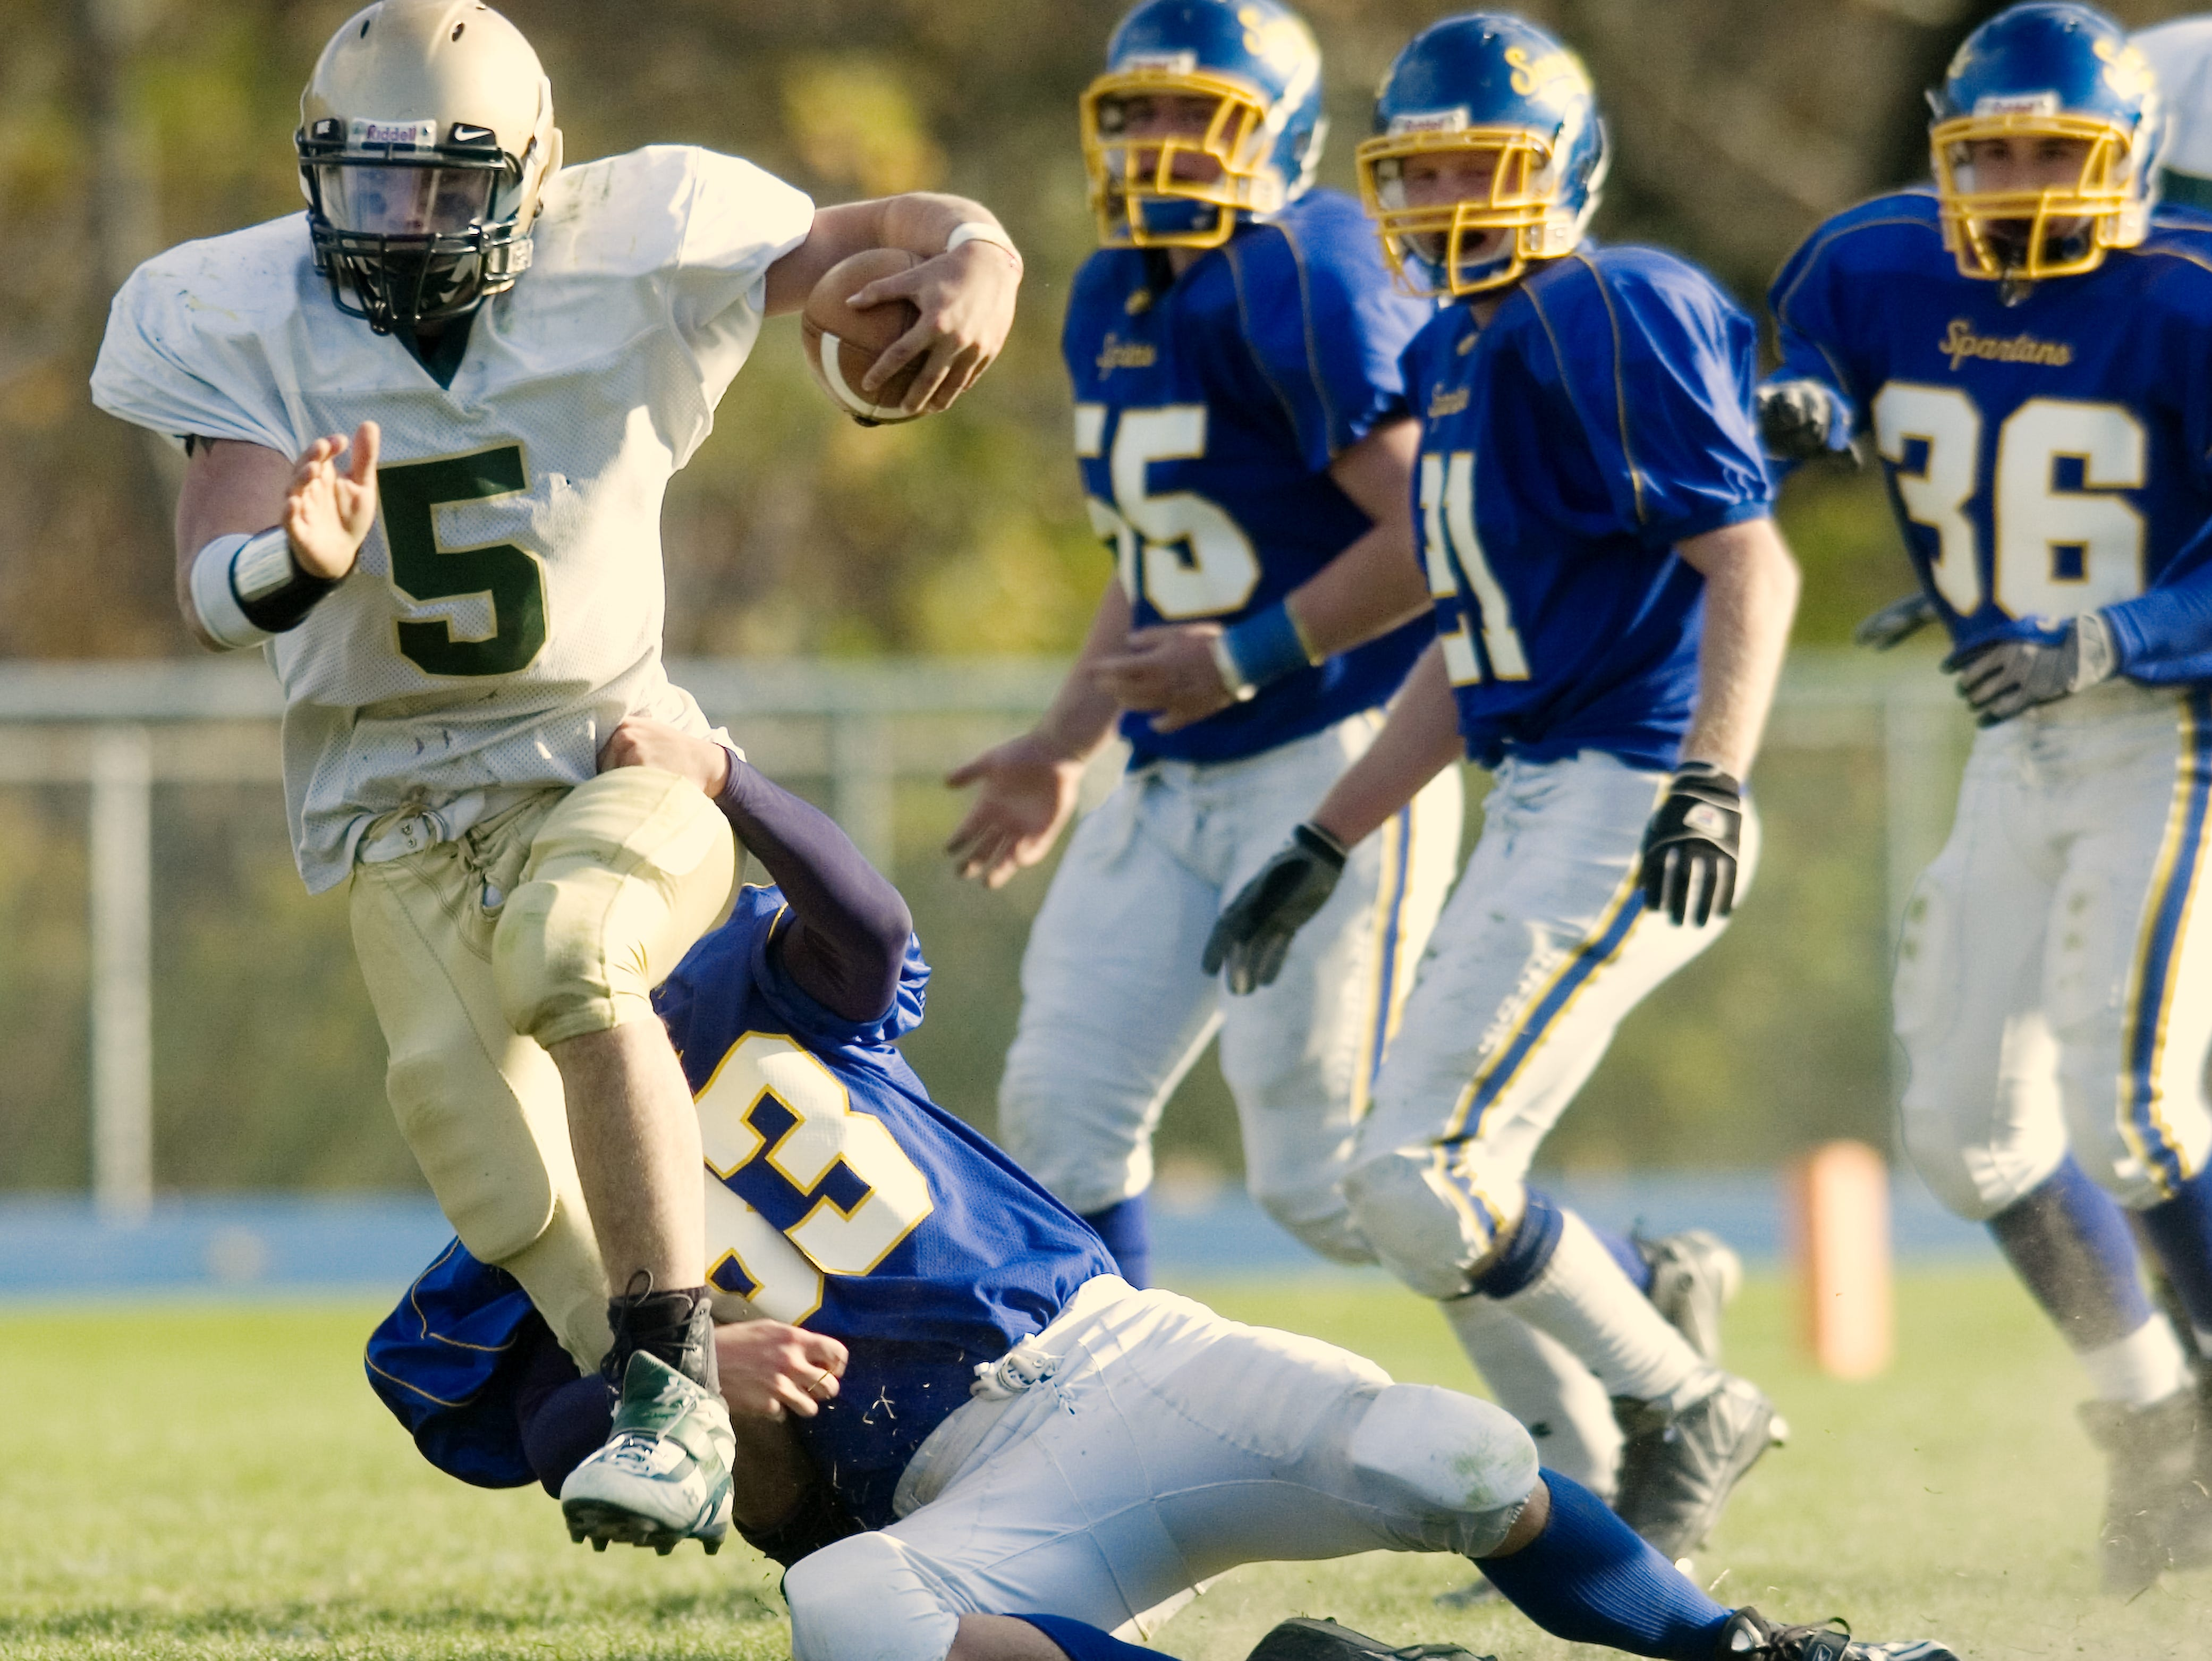 Maine-Endwell's Adam Rosenbarker, bottom, tackles Vestal's Cody Scepaniak in the third quarter of a 2008 game at M-E.